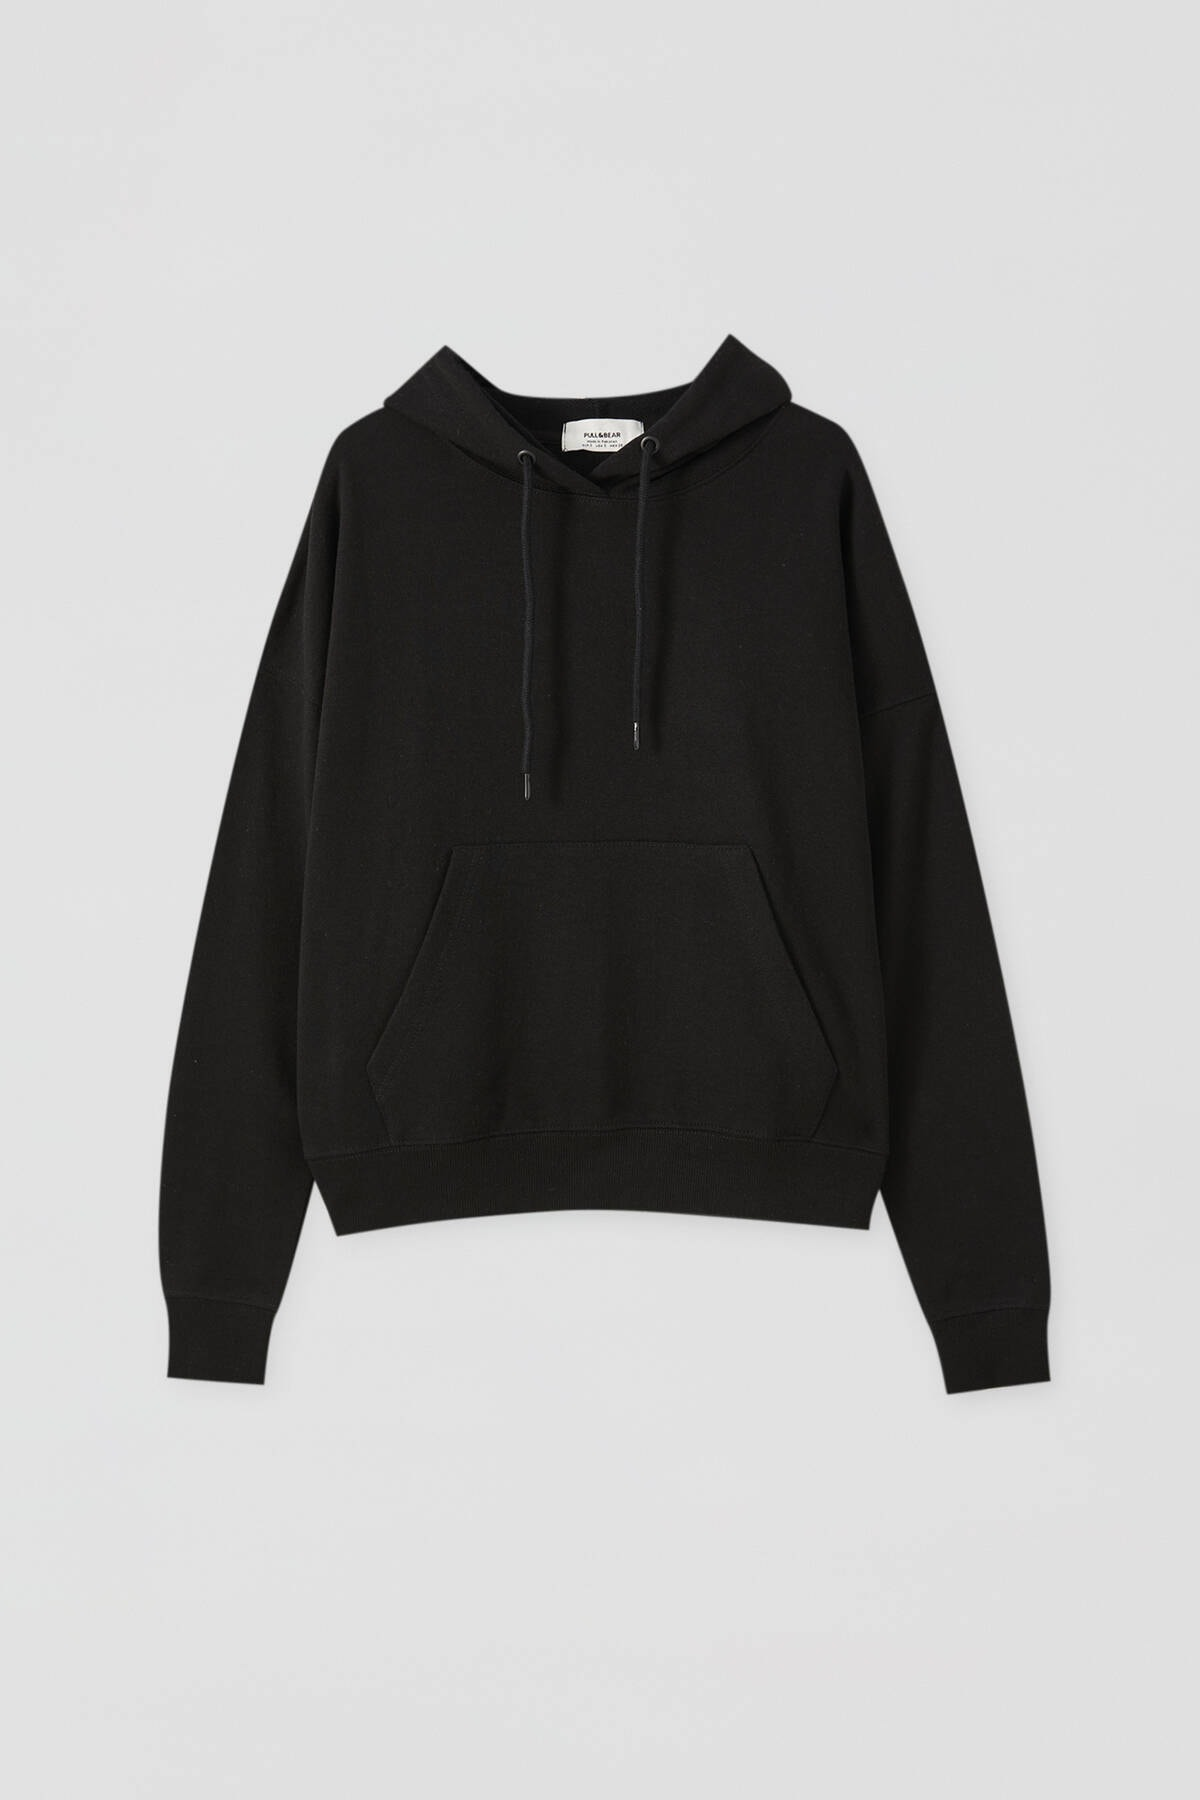 Pull & Bear Kadın Siyah Kanguru Cepli Kapüşonlu Sweatshirt 09594360 4